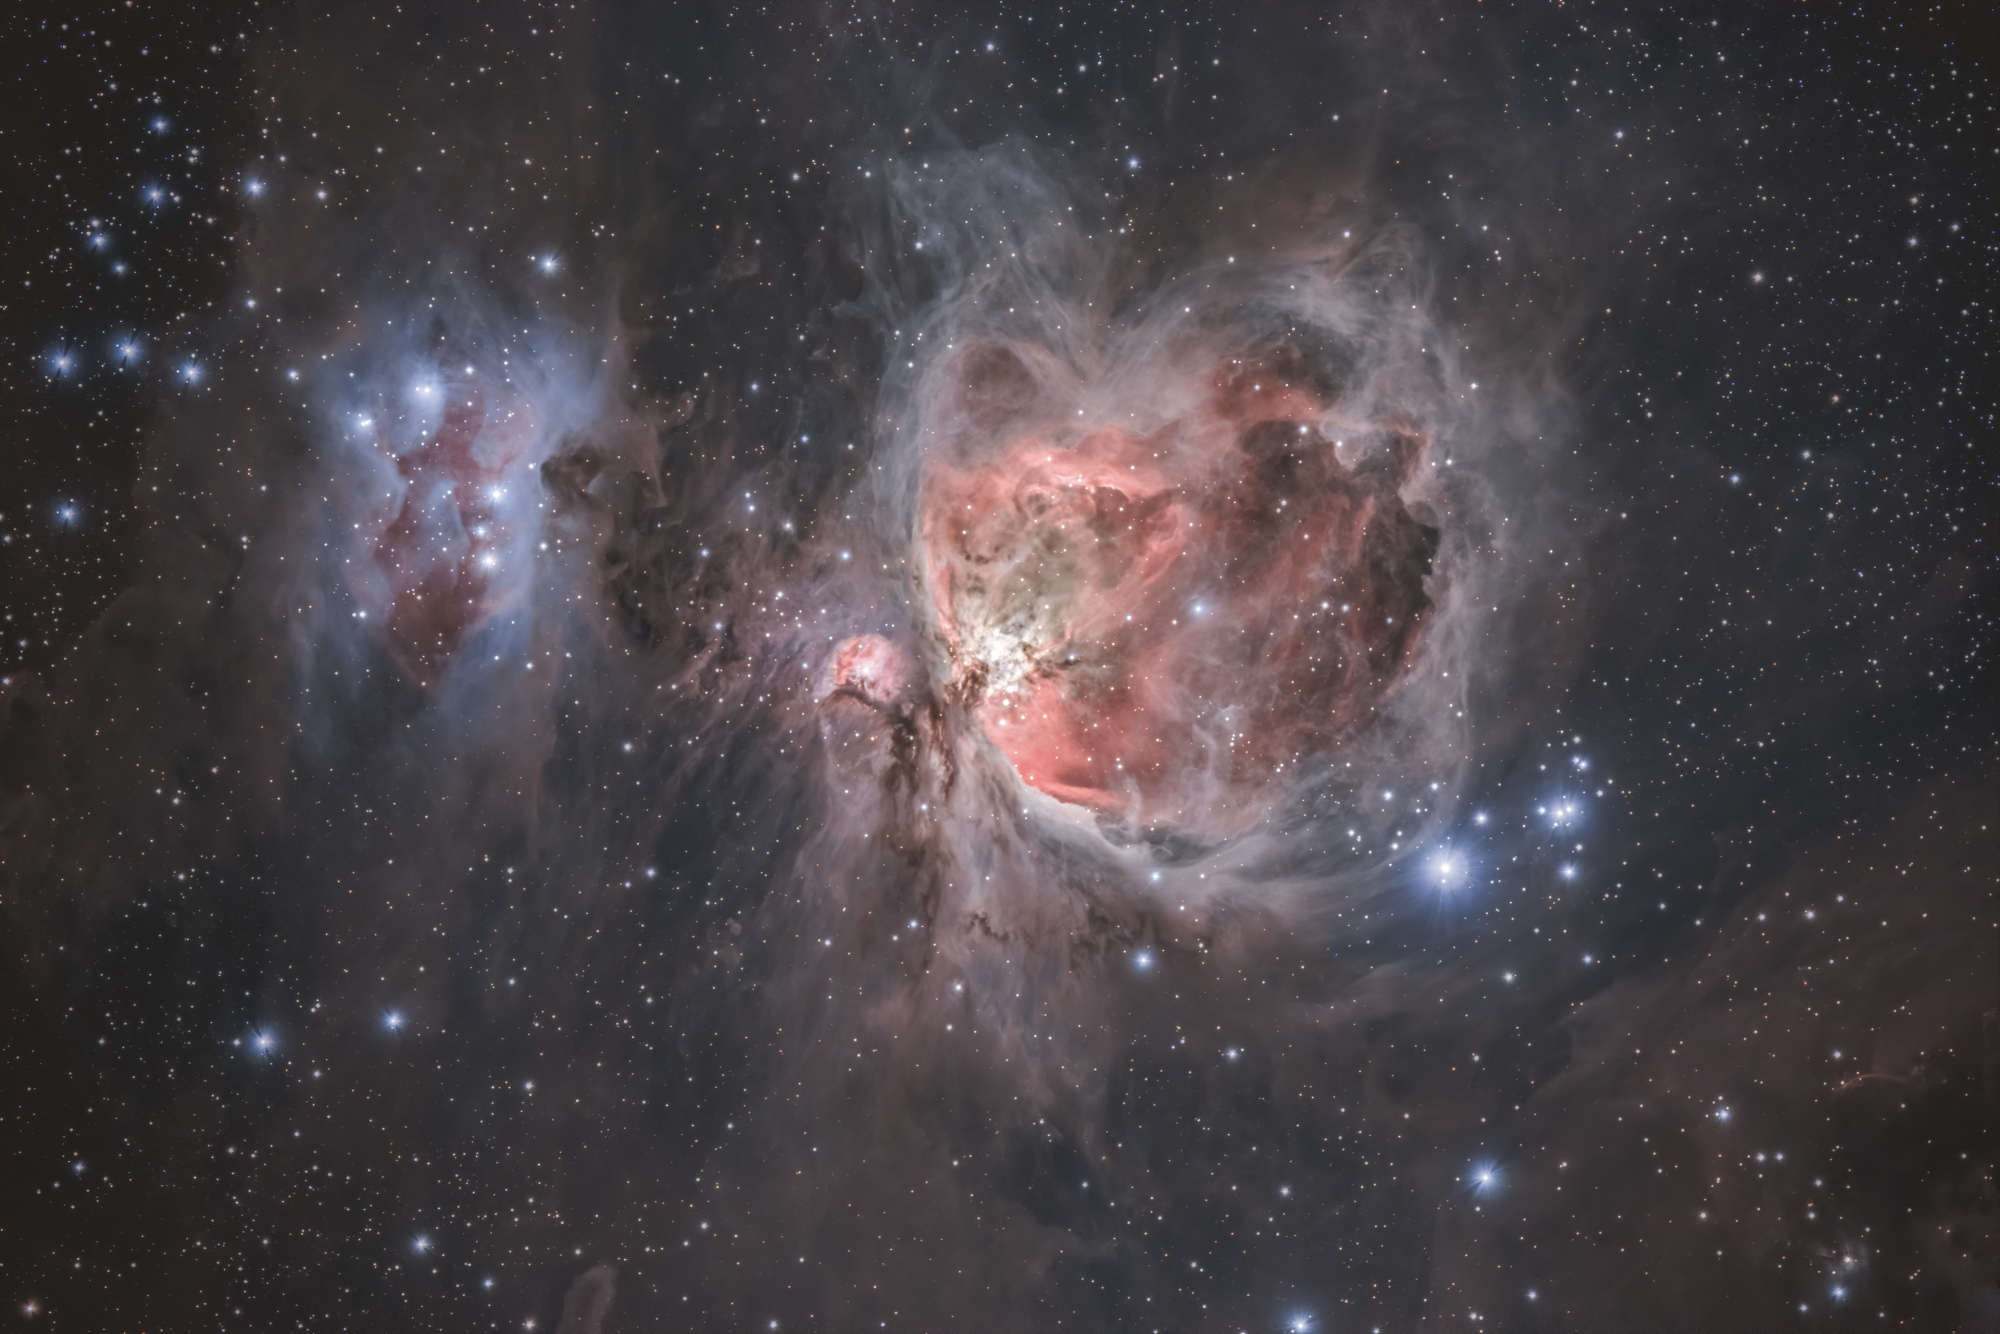 M42-denoise-3840.thumb.jpg.9e60ae5b7f5a86022e8f3750d1b42066.jpg